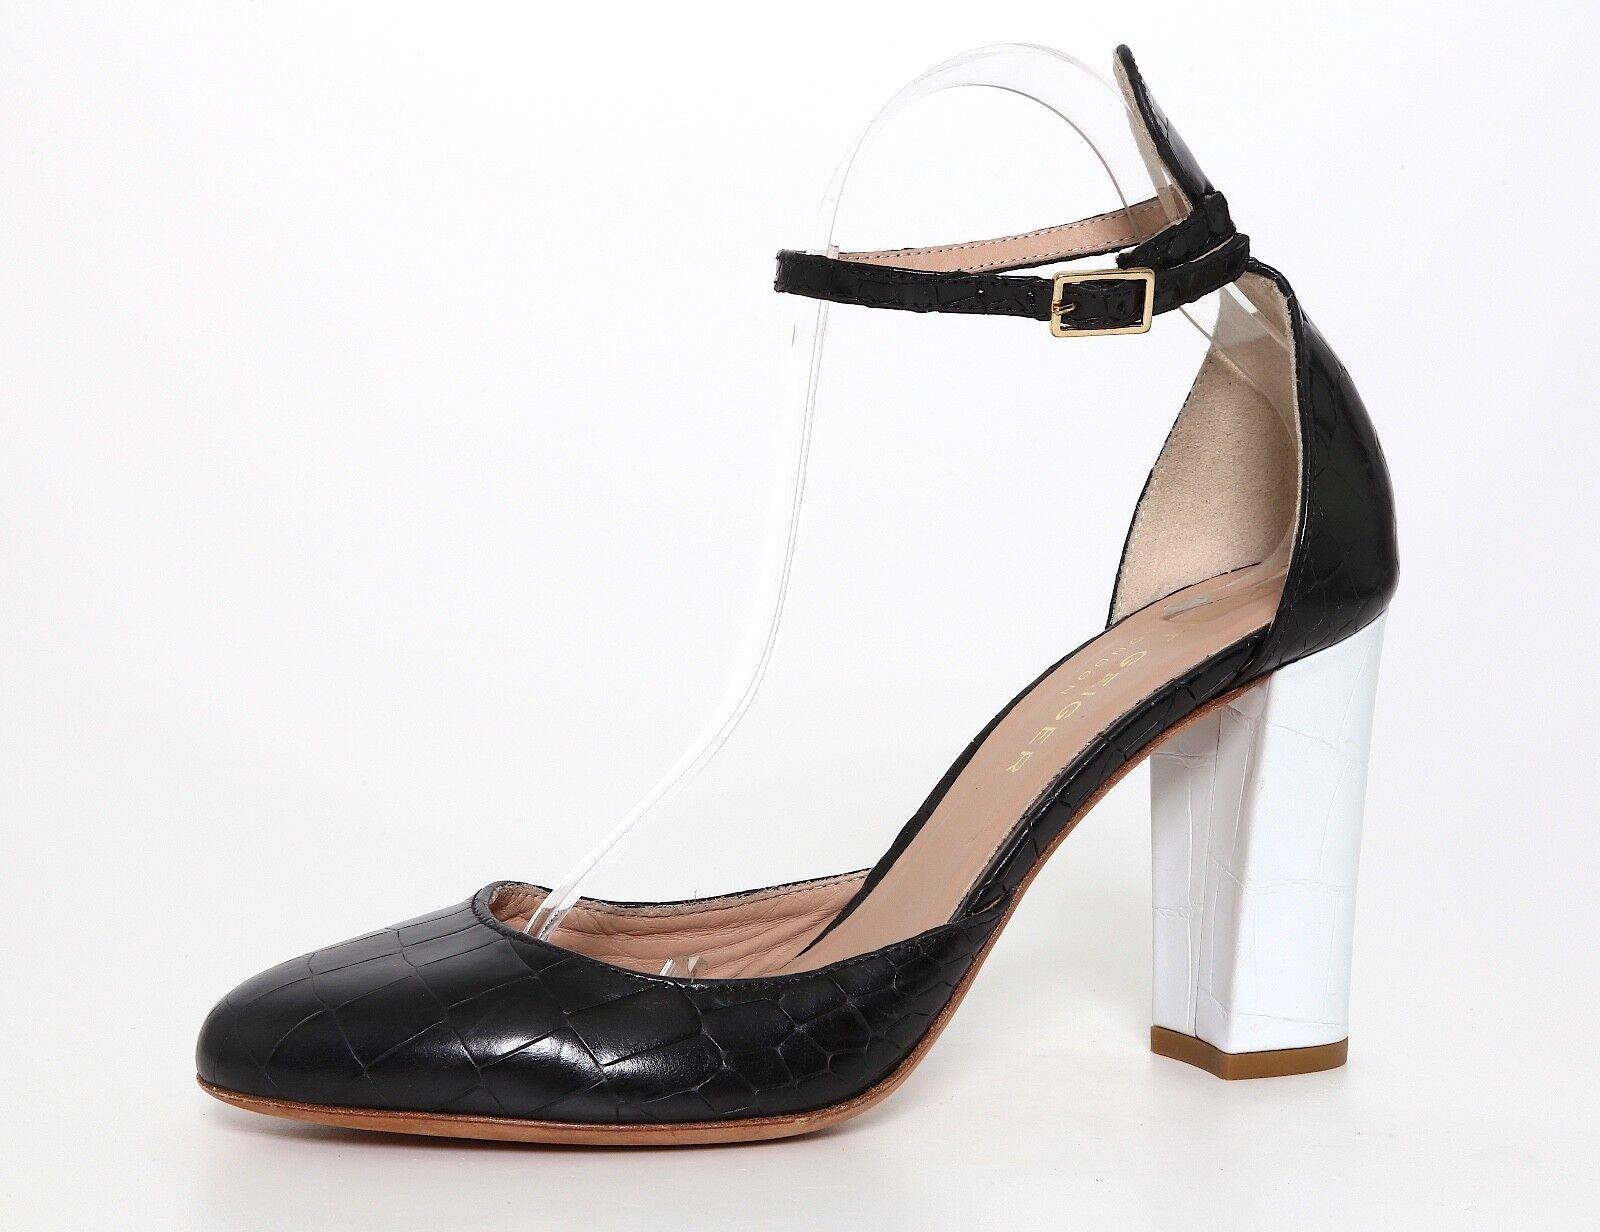 Kurt Geiger Myra Ankle Strap Leather Heels Black Women Sz 40 EUR 1152